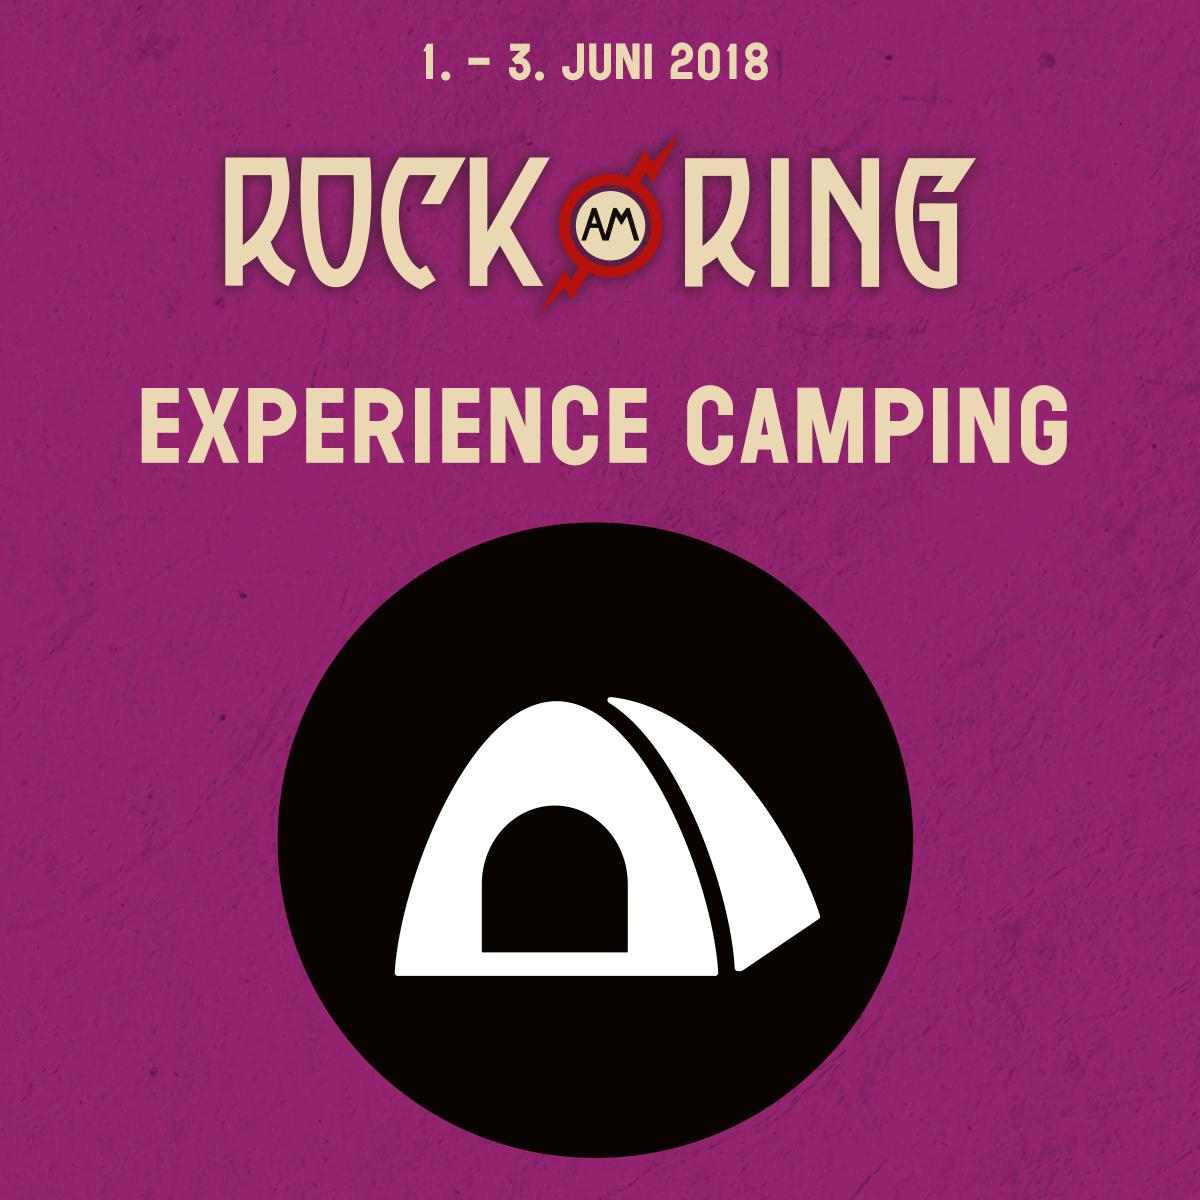 Wichtige Ticket Hinweise Rock Am Ring News